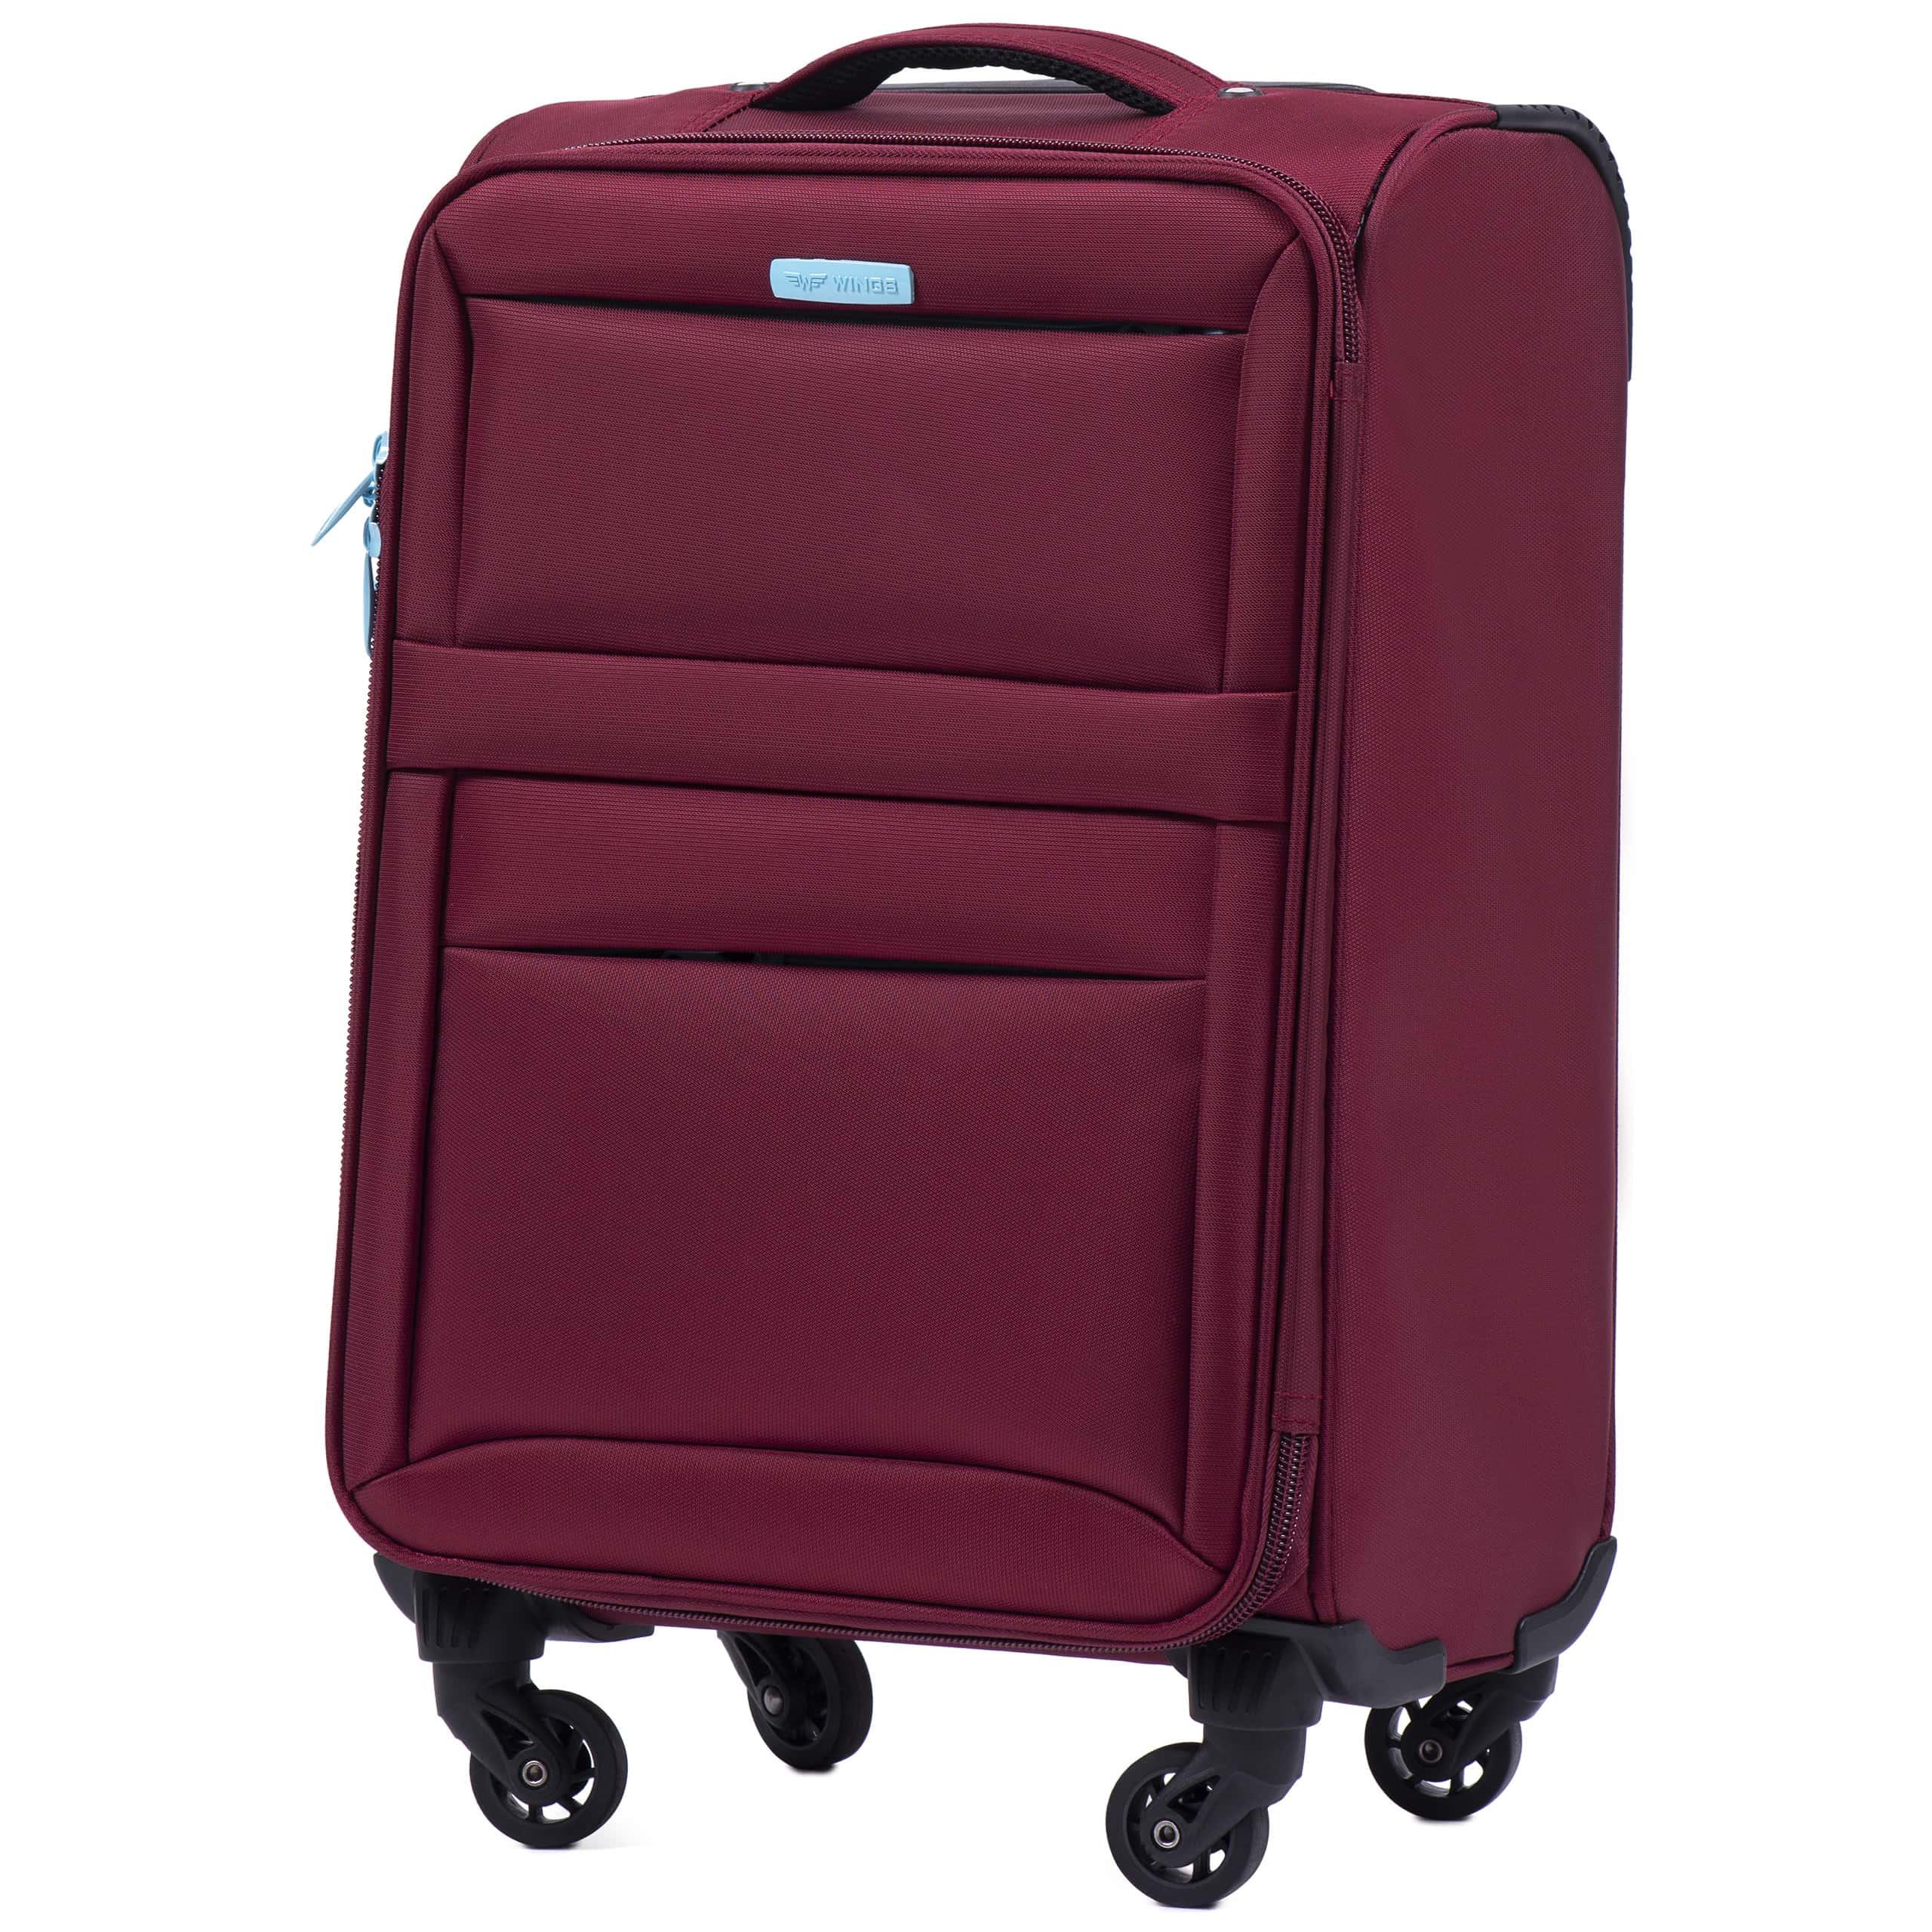 Чемодан Ультра-Легкий 'Wings' 2861 тканевый Малый  (S) на 4-х колесах RED. Для ручной Клади до 10 кг